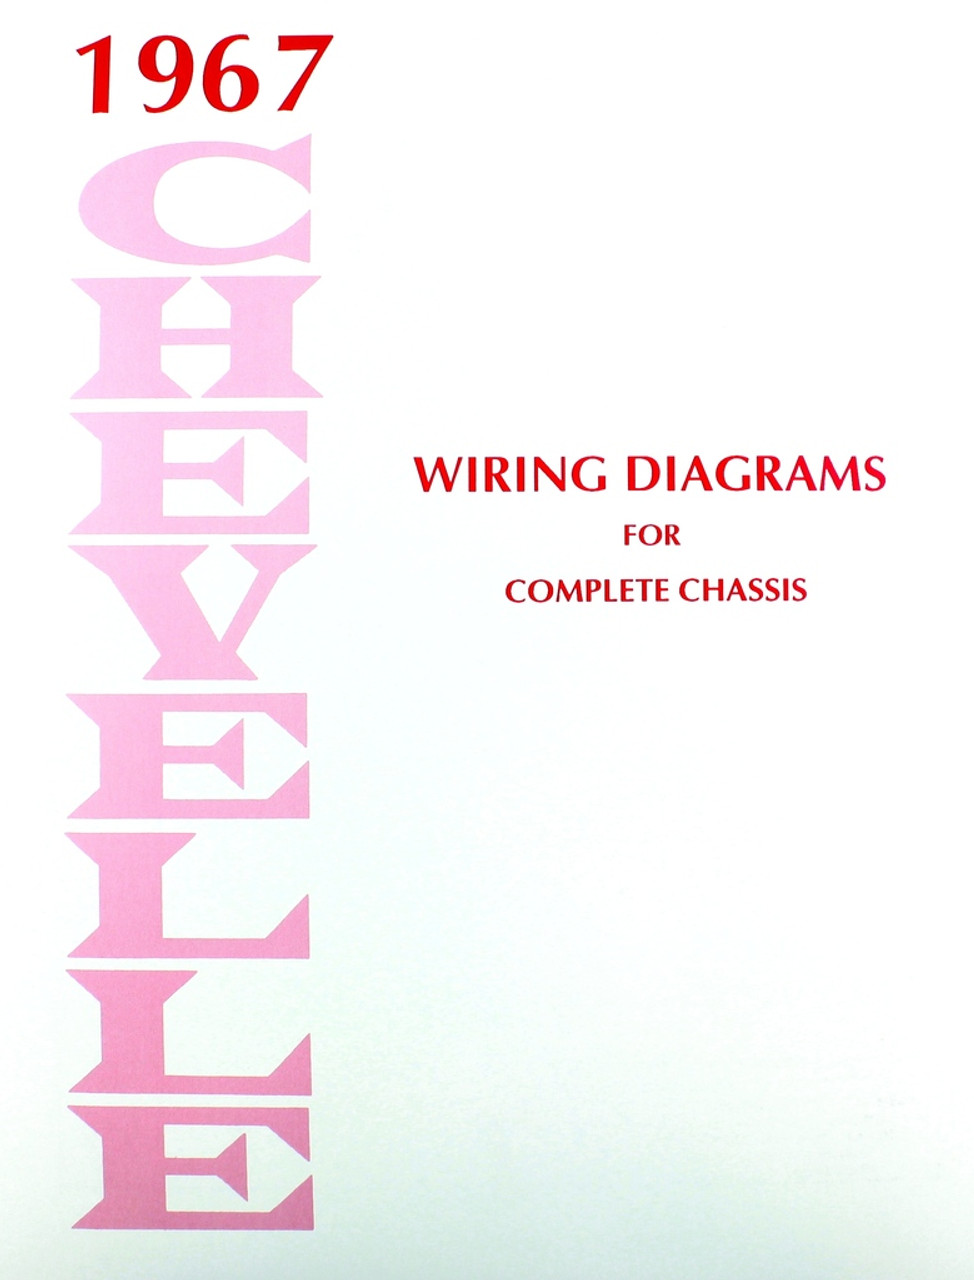 L1806_zps5glytoor__39425.1507589644?c\=2 1967 chevy impala wiring diagram 1974 chevy c10 wiring diagram 1964 el camino wiring diagram at gsmx.co